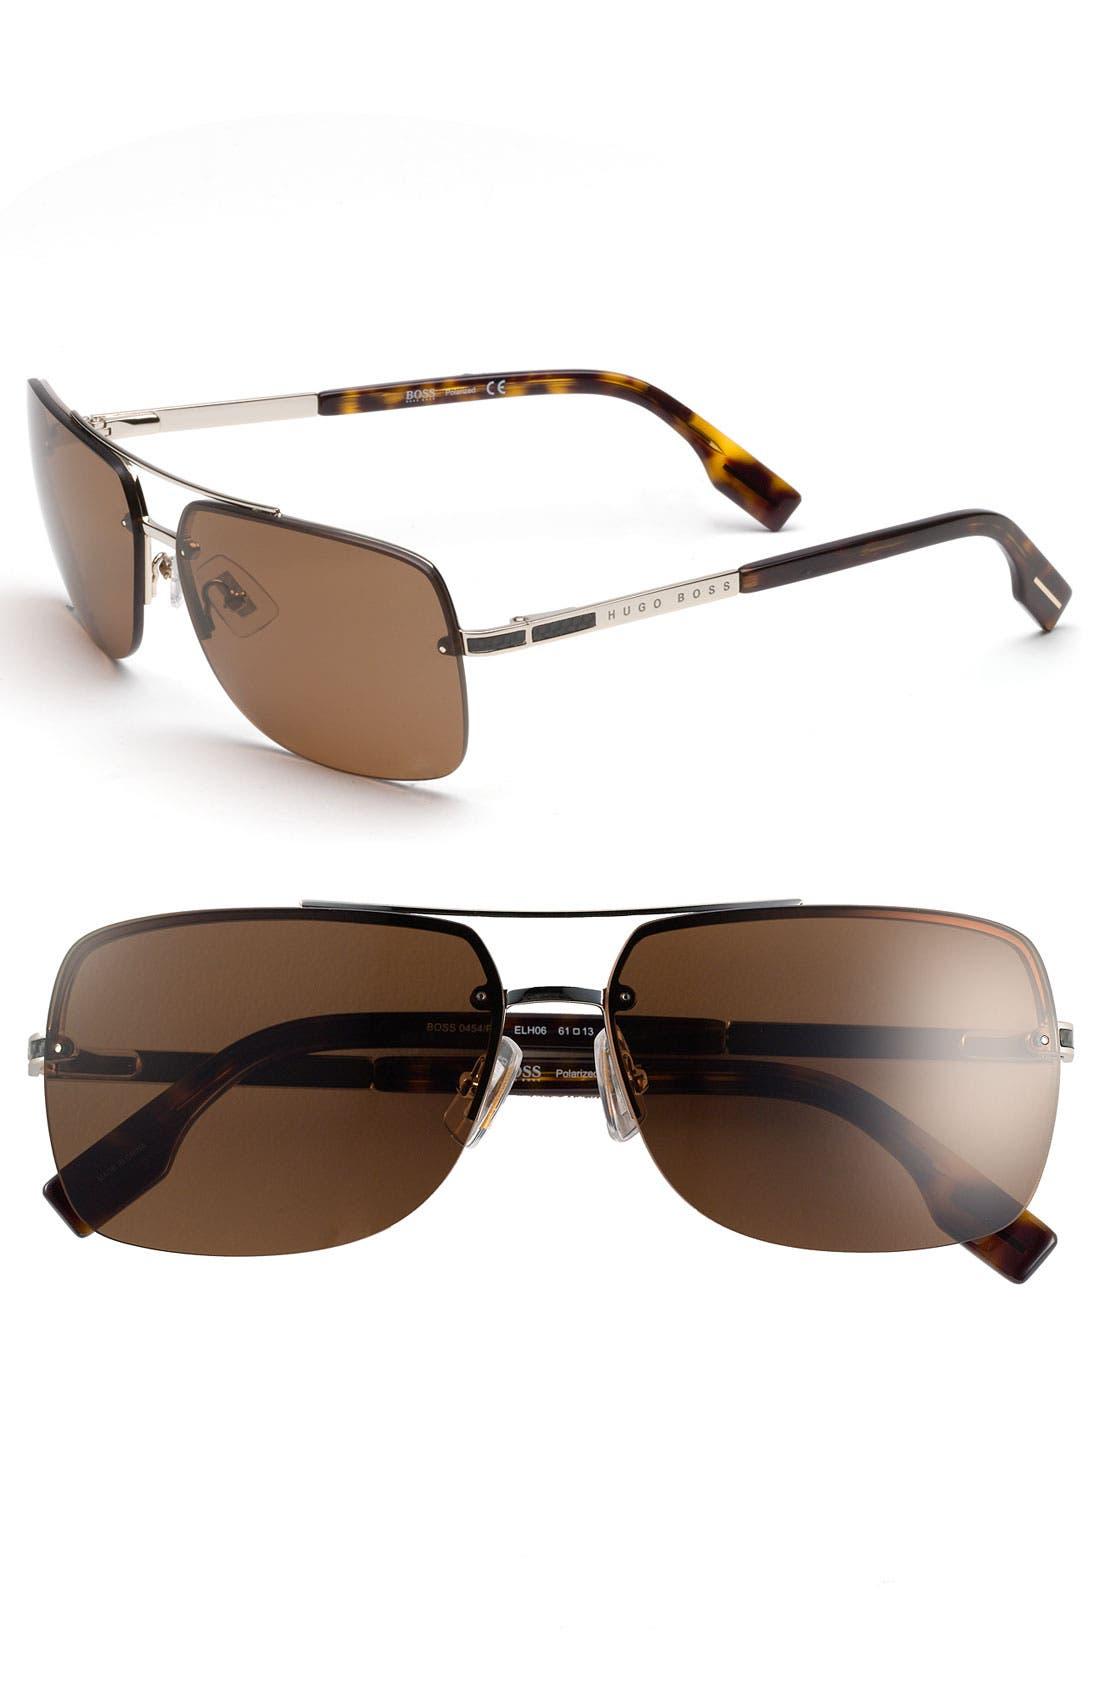 Main Image - BOSS HUGO BOSS 61mm Polarized Navigator Sunglasses